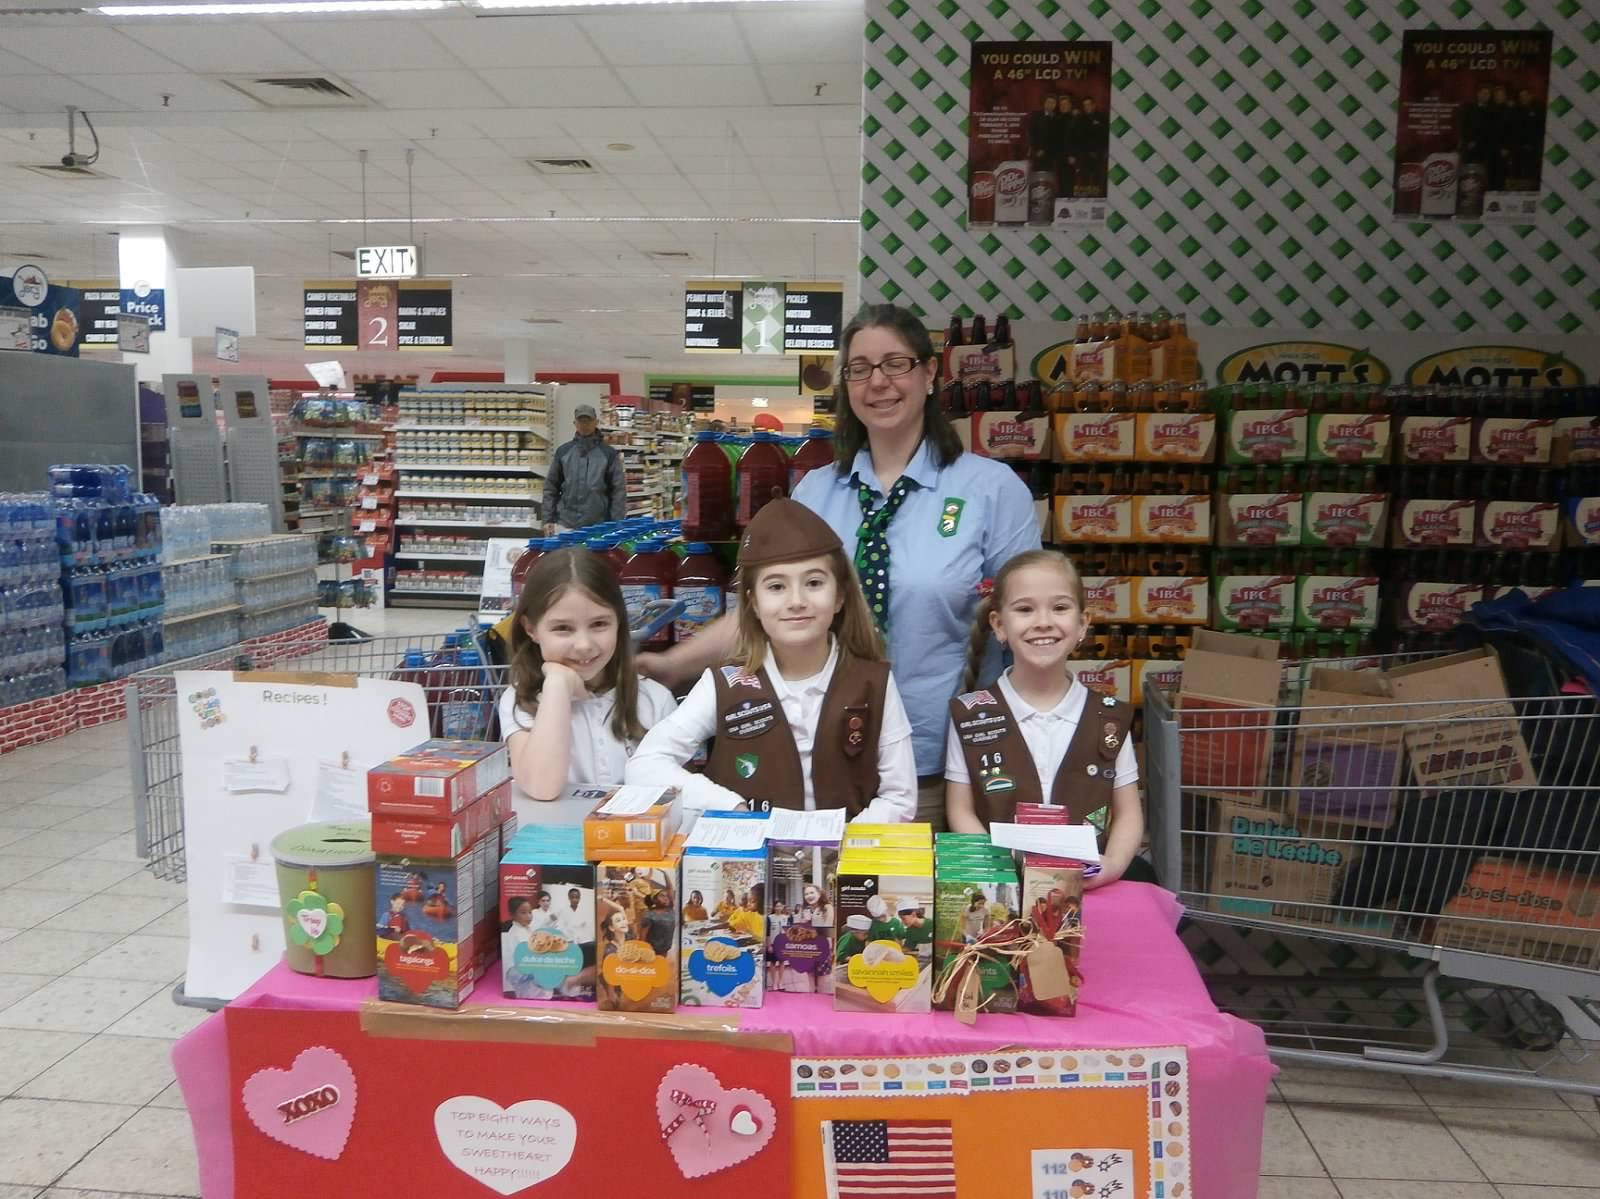 GirlScoutsSellingCookiesAtCommissary